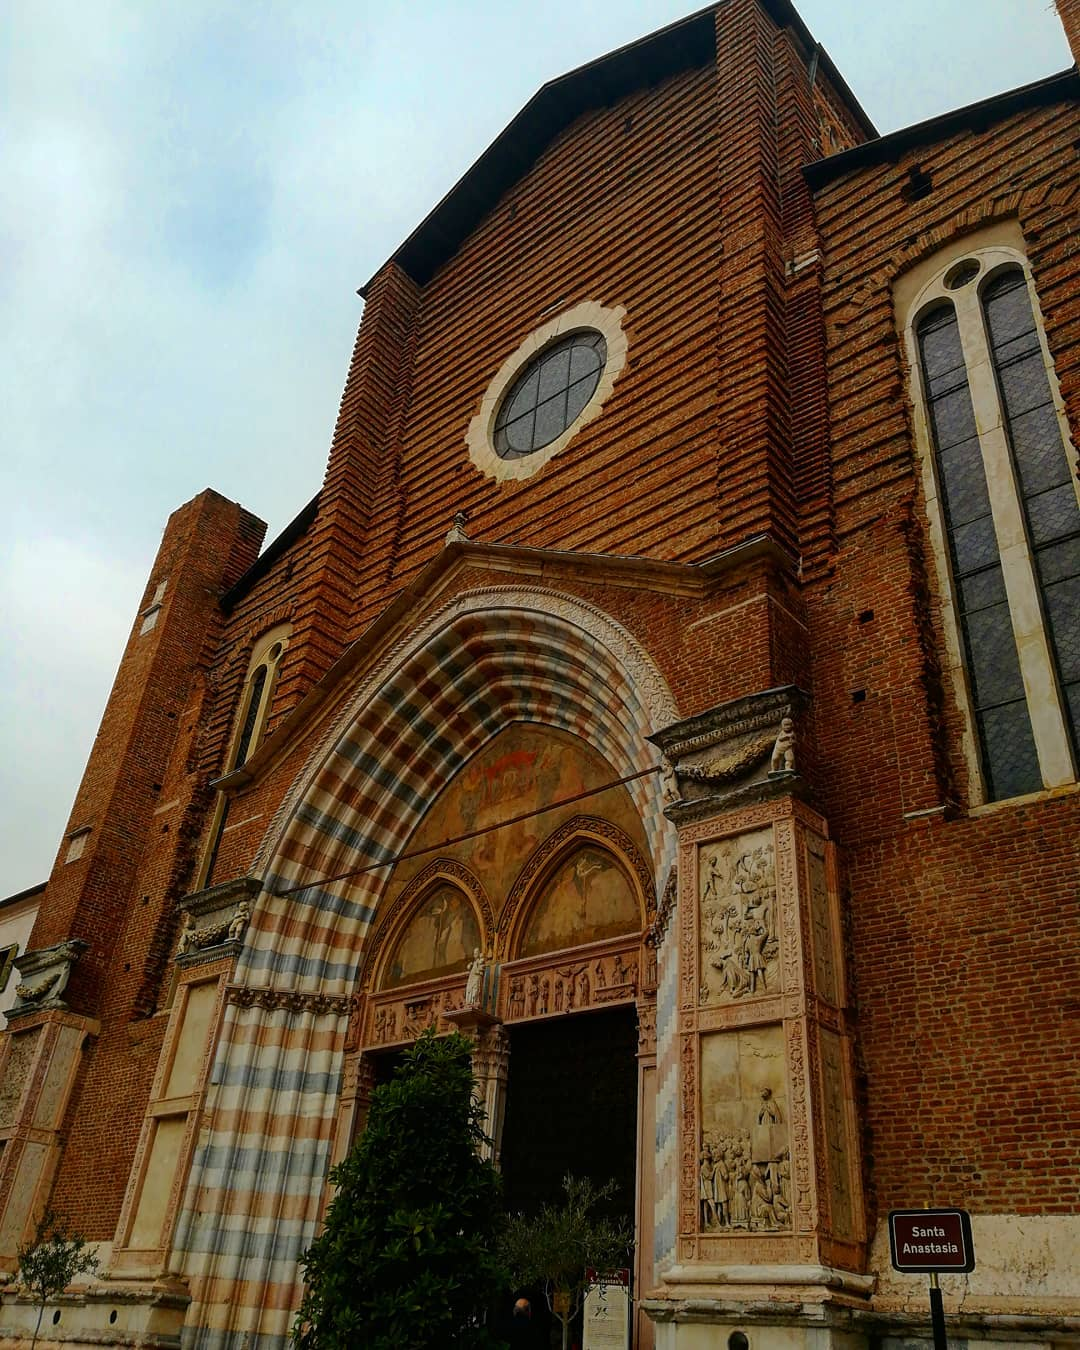 Chiesa di Santa Anastasia gita a Verona GetCOO